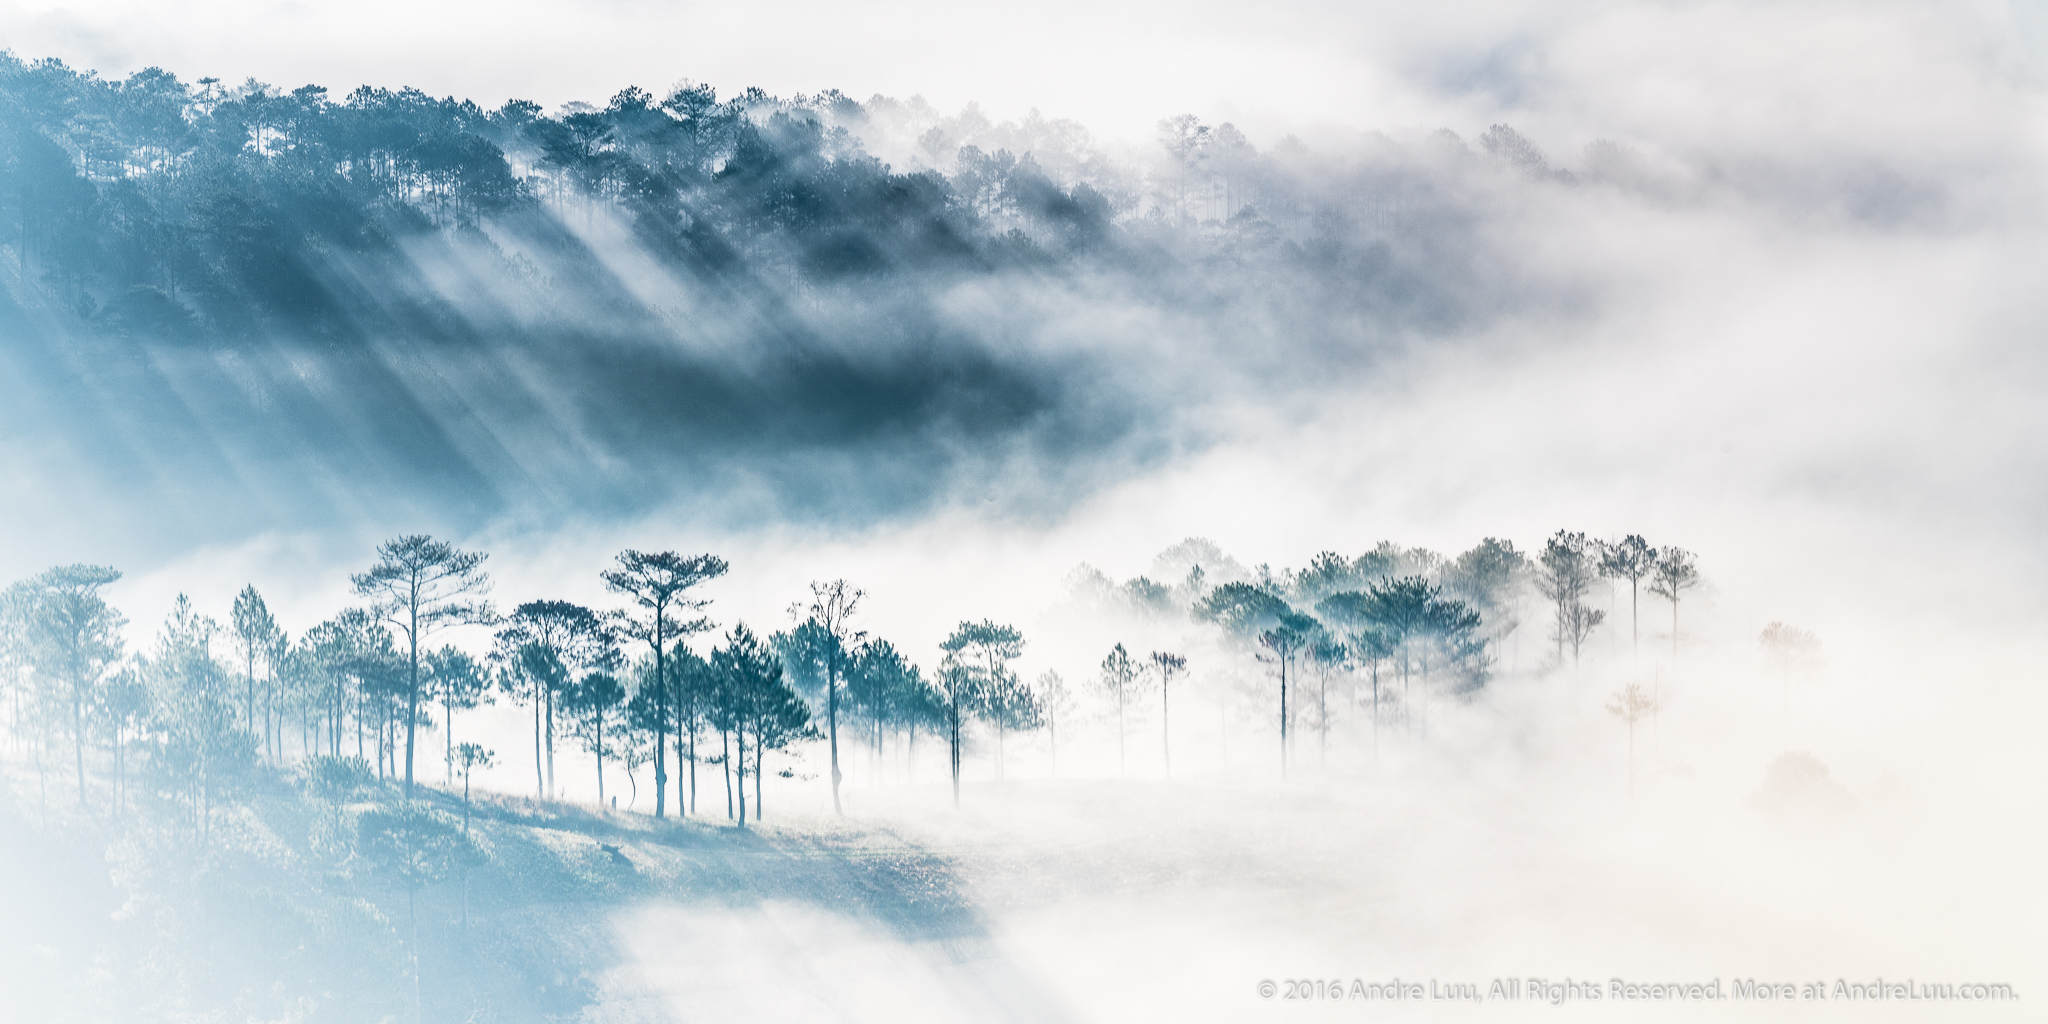 BỨC HỌA ĐỒI SƯƠNG (Hillside Pastel) 1/50s f/11 ISO 100 WB 4450K. Sony a7rII + Contax N 70-300 @ 140mm. Hòn Bồ, Dalat. 12/2/16 @ 6:55am.